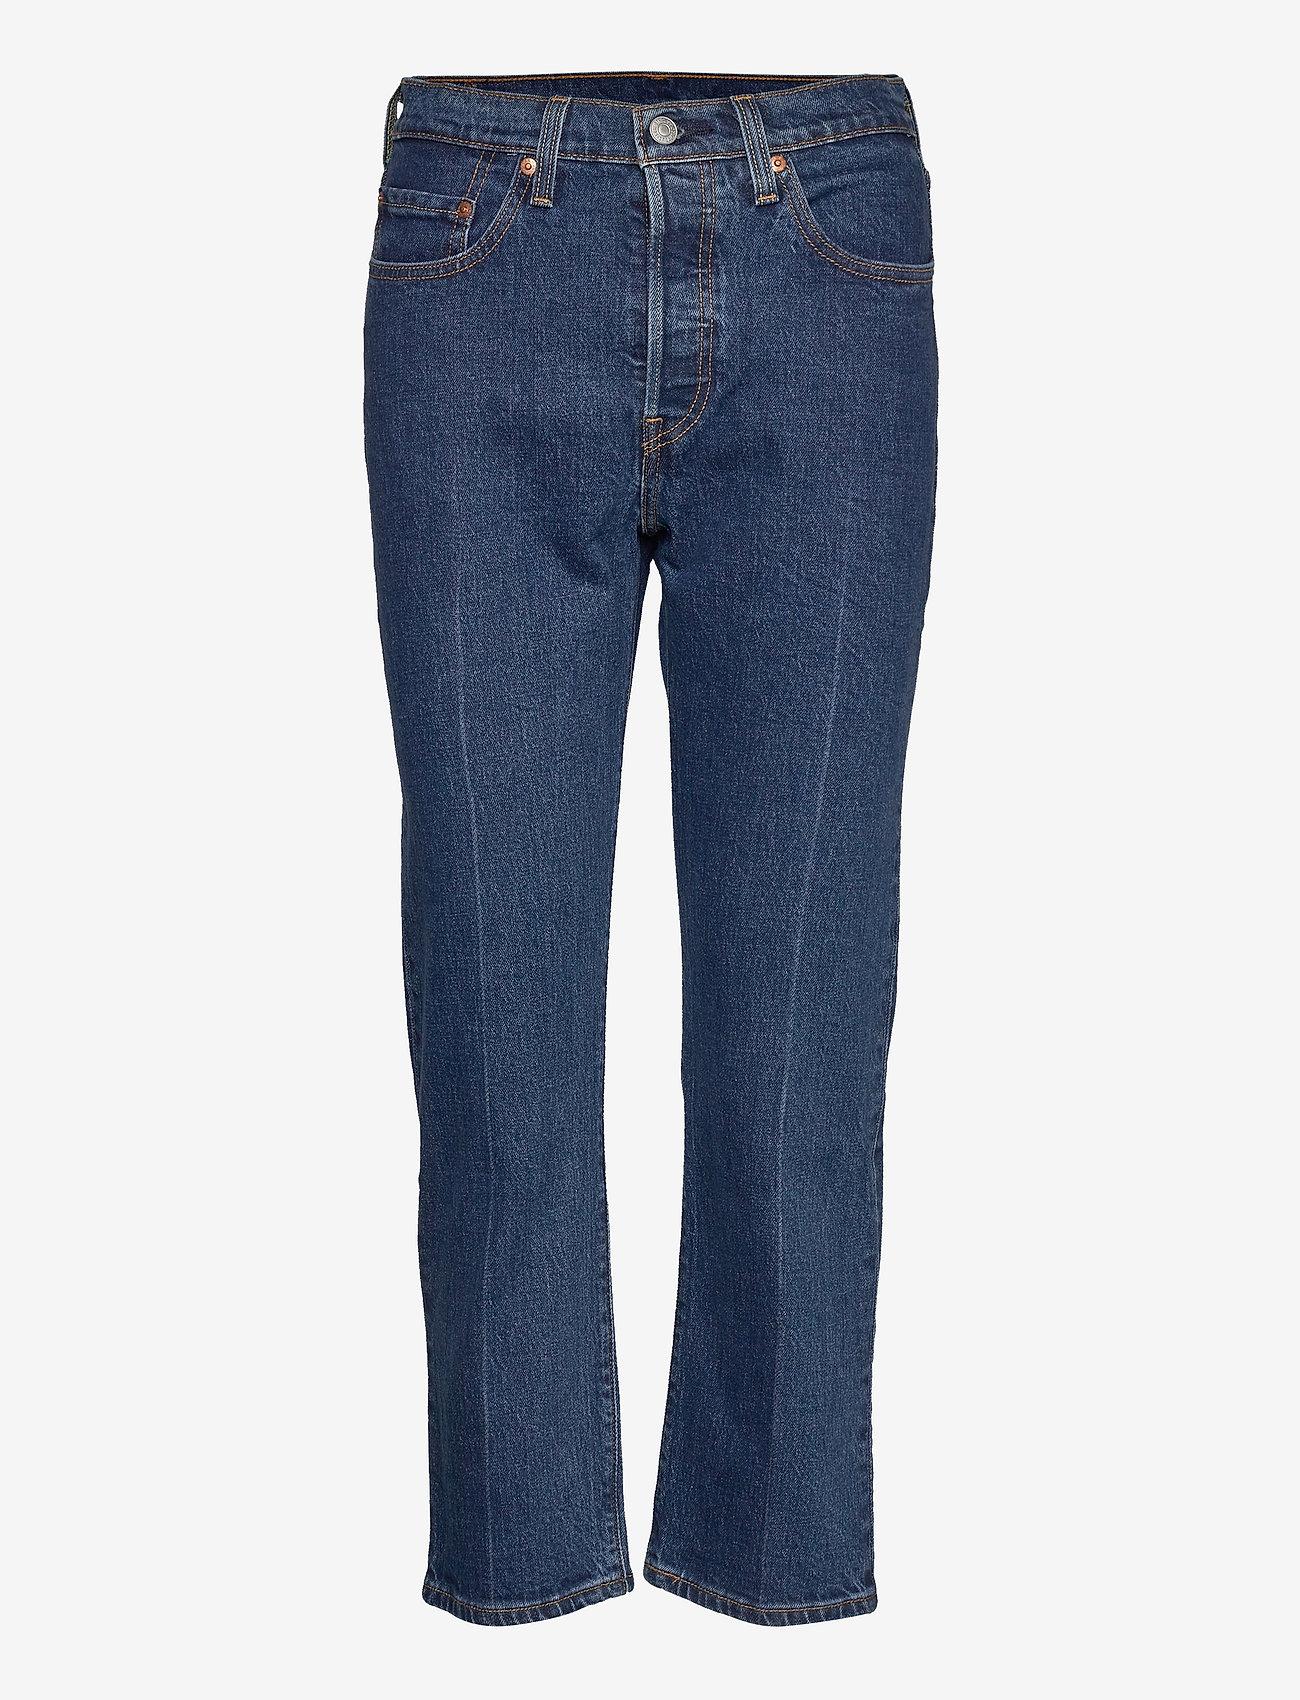 LEVI´S Women - 501 CROP CHARLESTON PRESSED - straight jeans - dark indigo - flat finish - 0